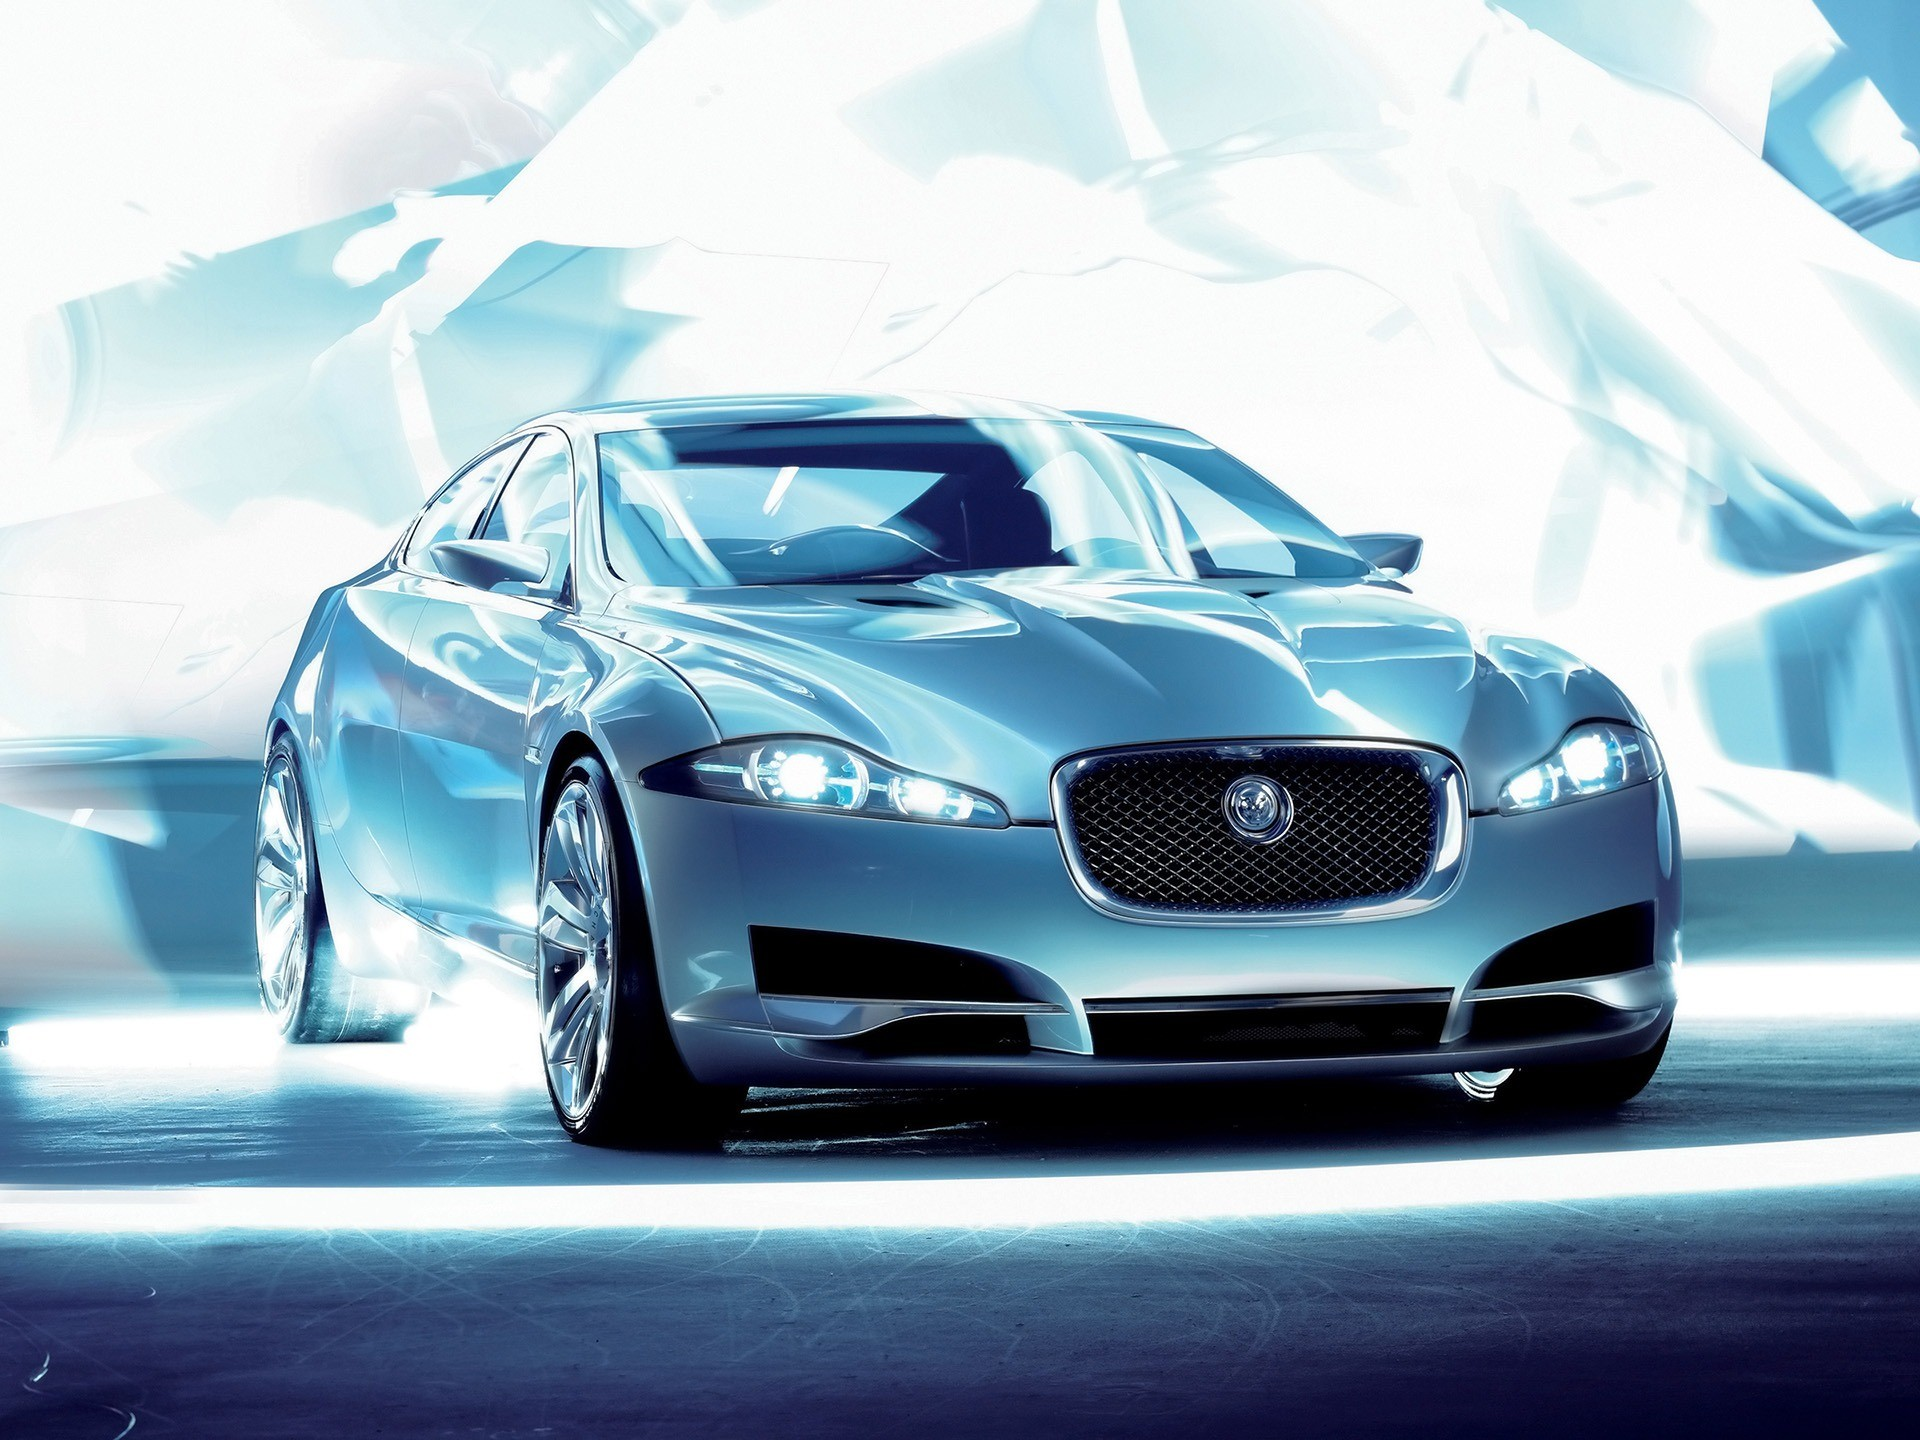 Jaguar C XF Front Angle Wallpaper Concept Cars